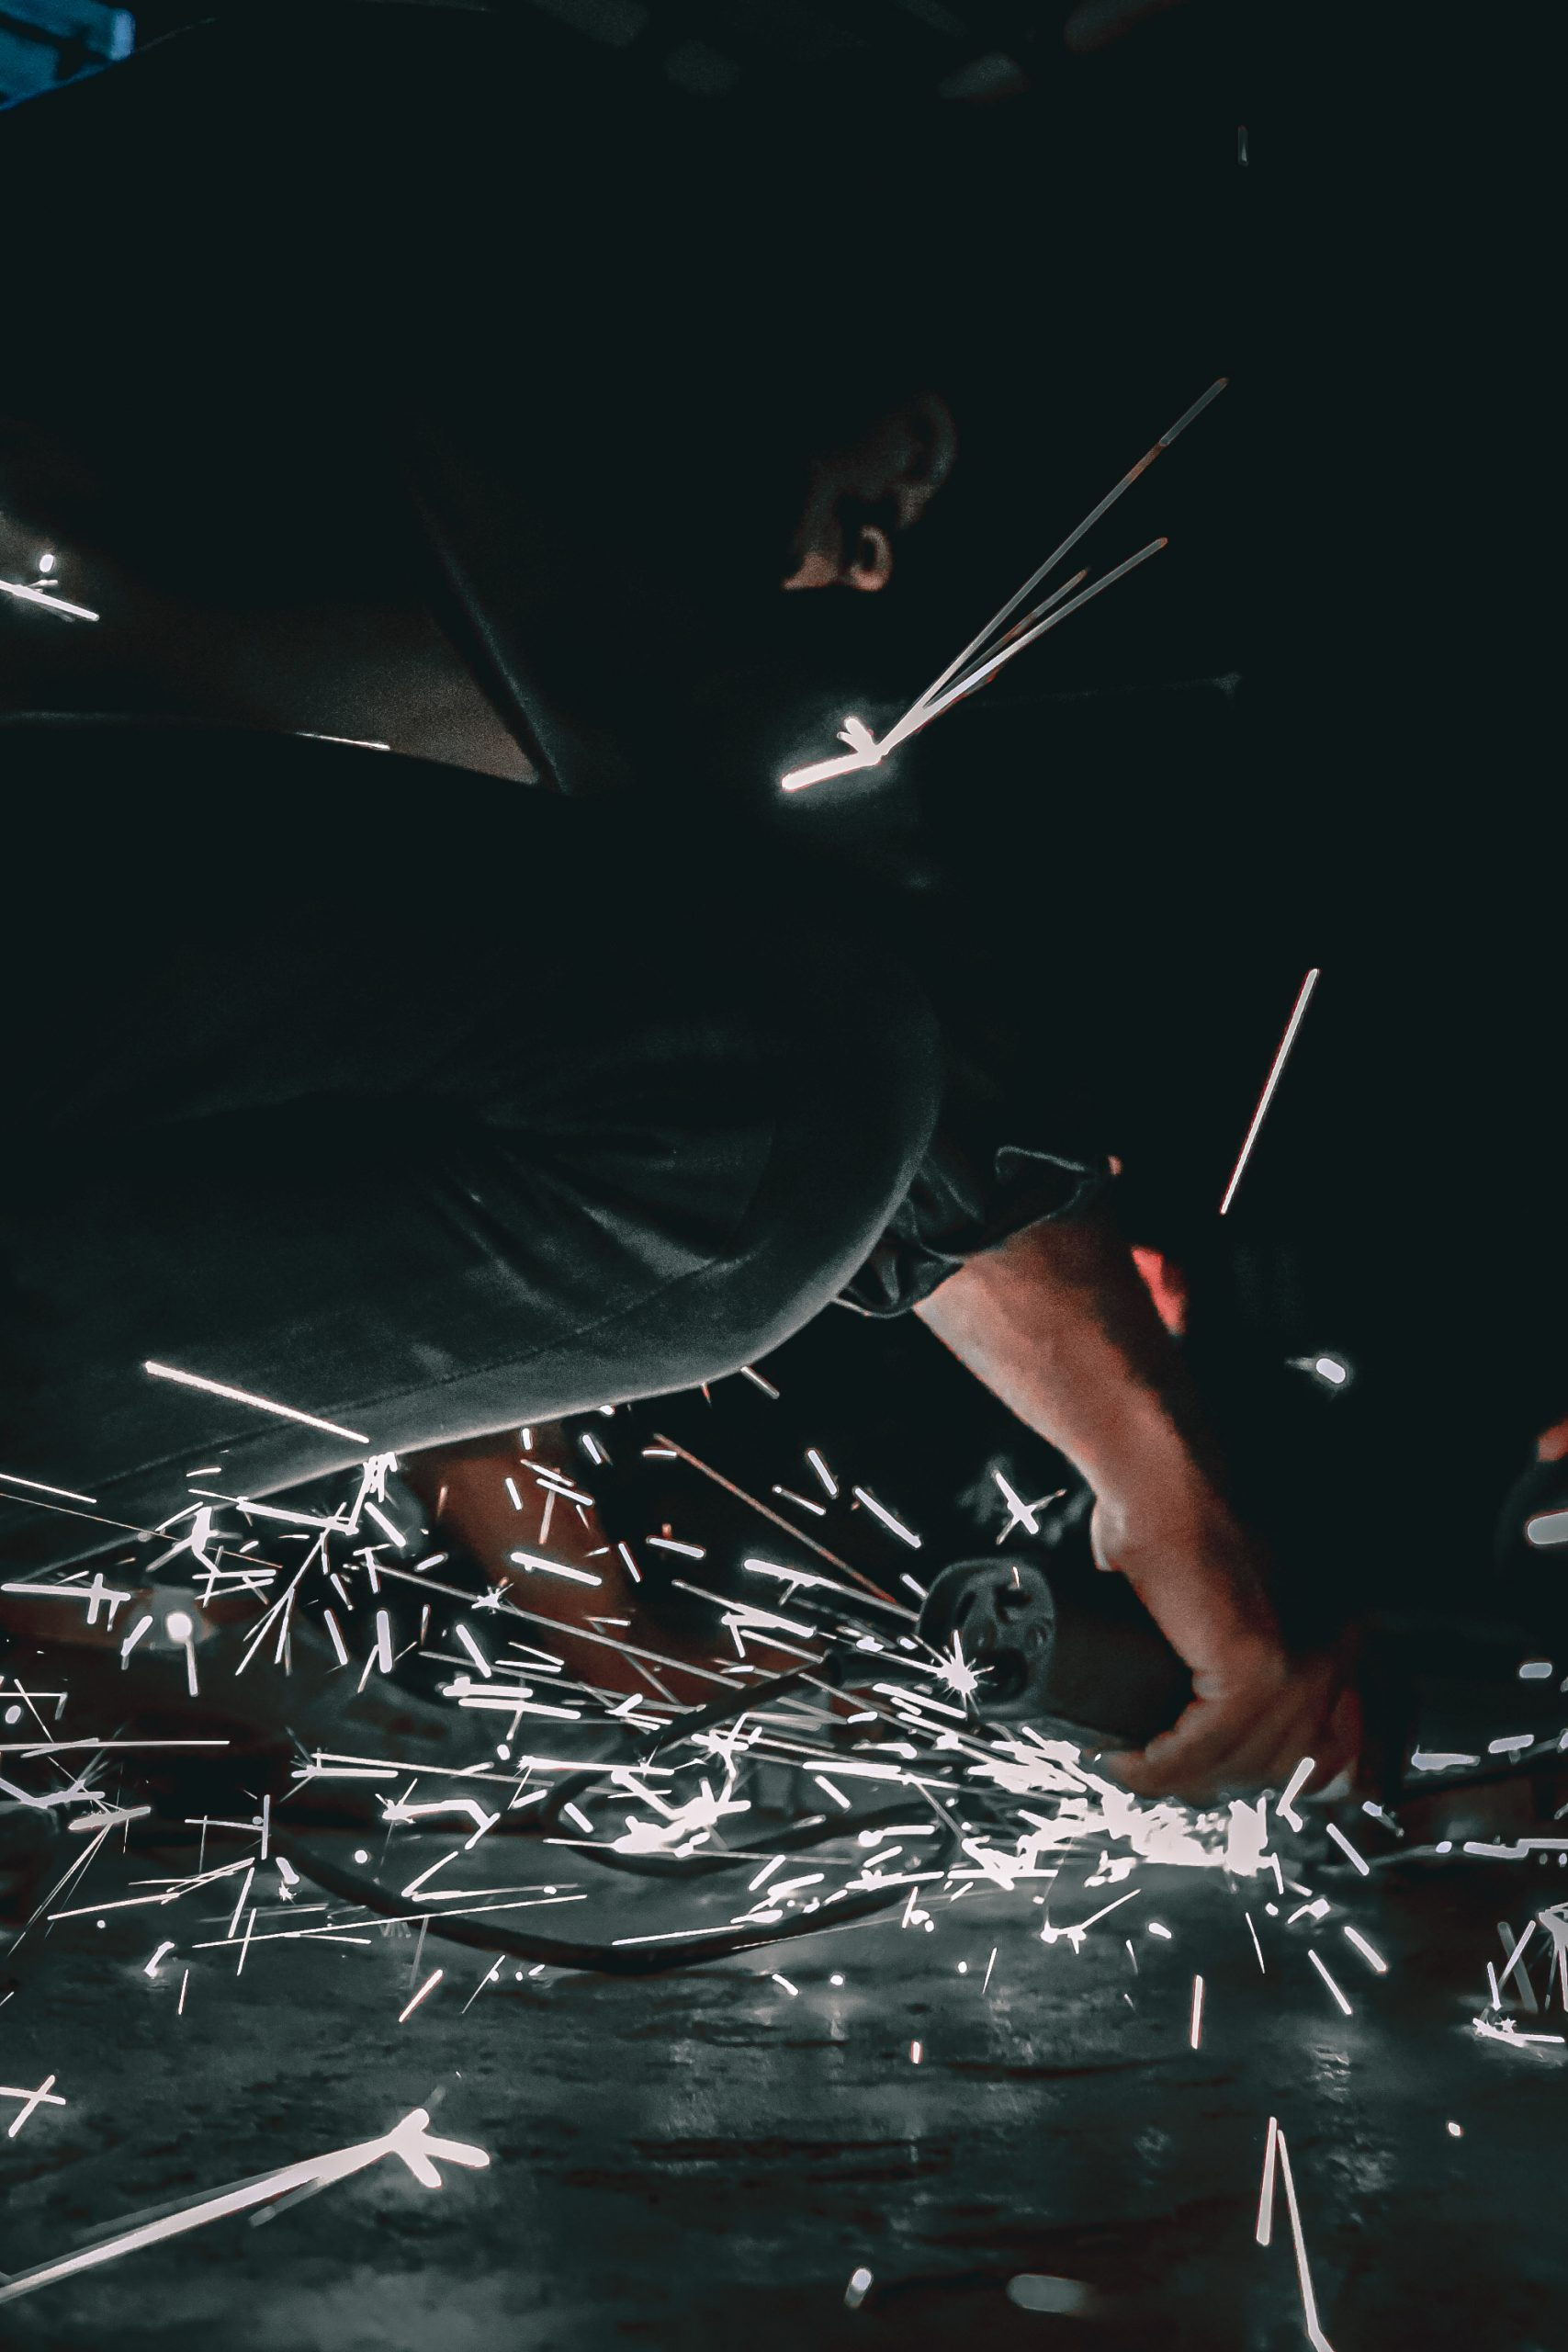 A technician cutting metal piece